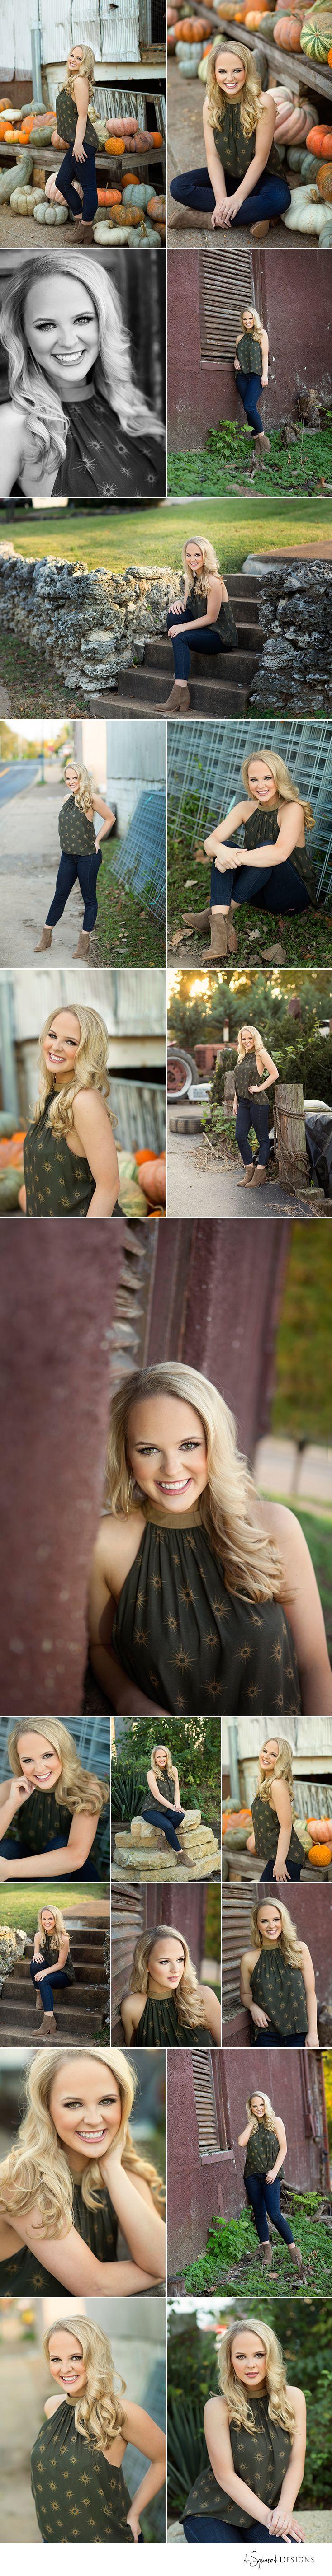 d-Squared Designs Columbia, MO Senior Photography. Fall senior photography. Gorgeous senior girl. Fall senior session. Girl posing ideas.